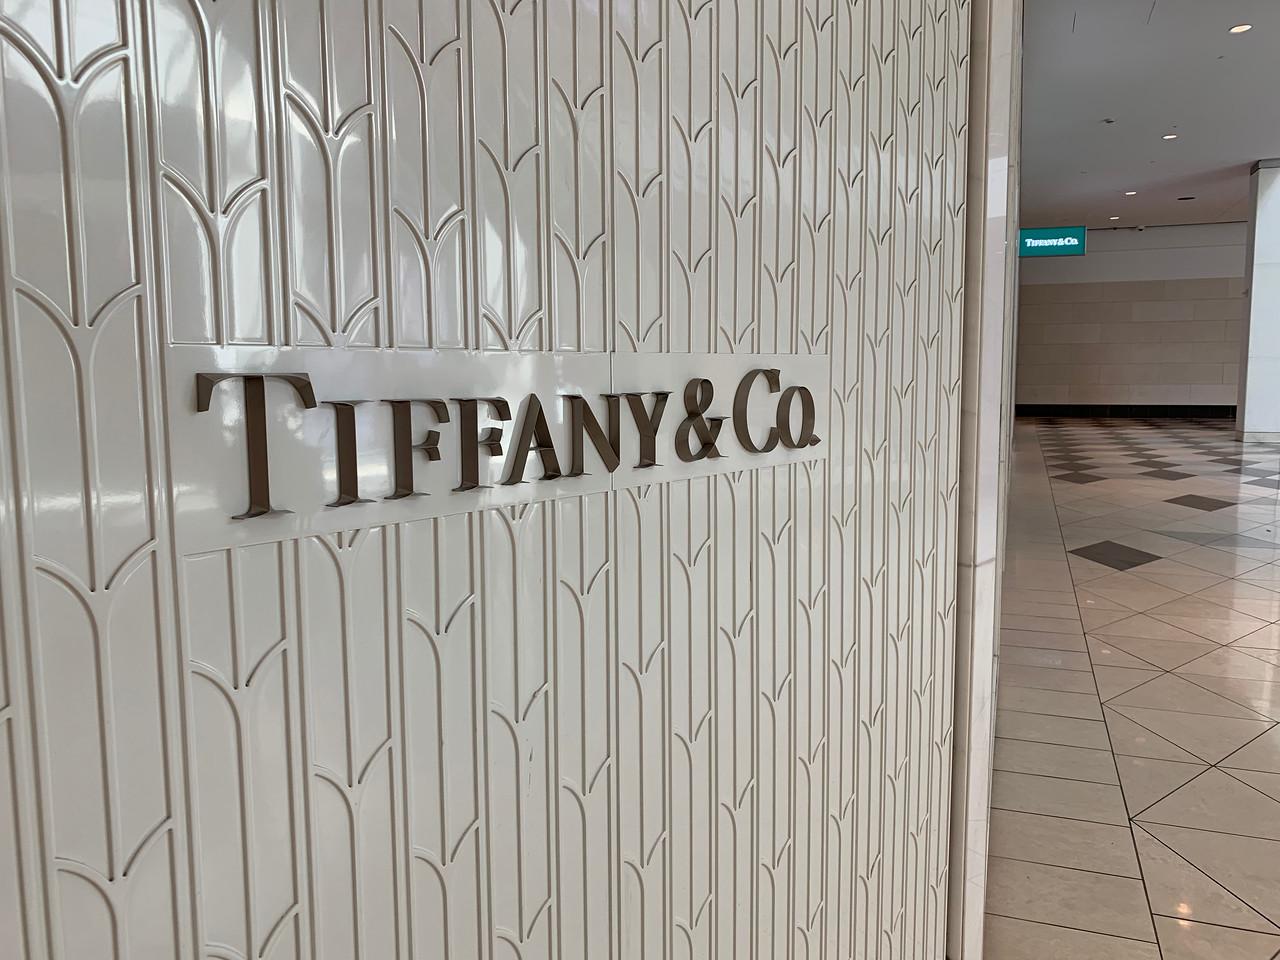 Tiffany & Co Valley Fair-X2.jpg